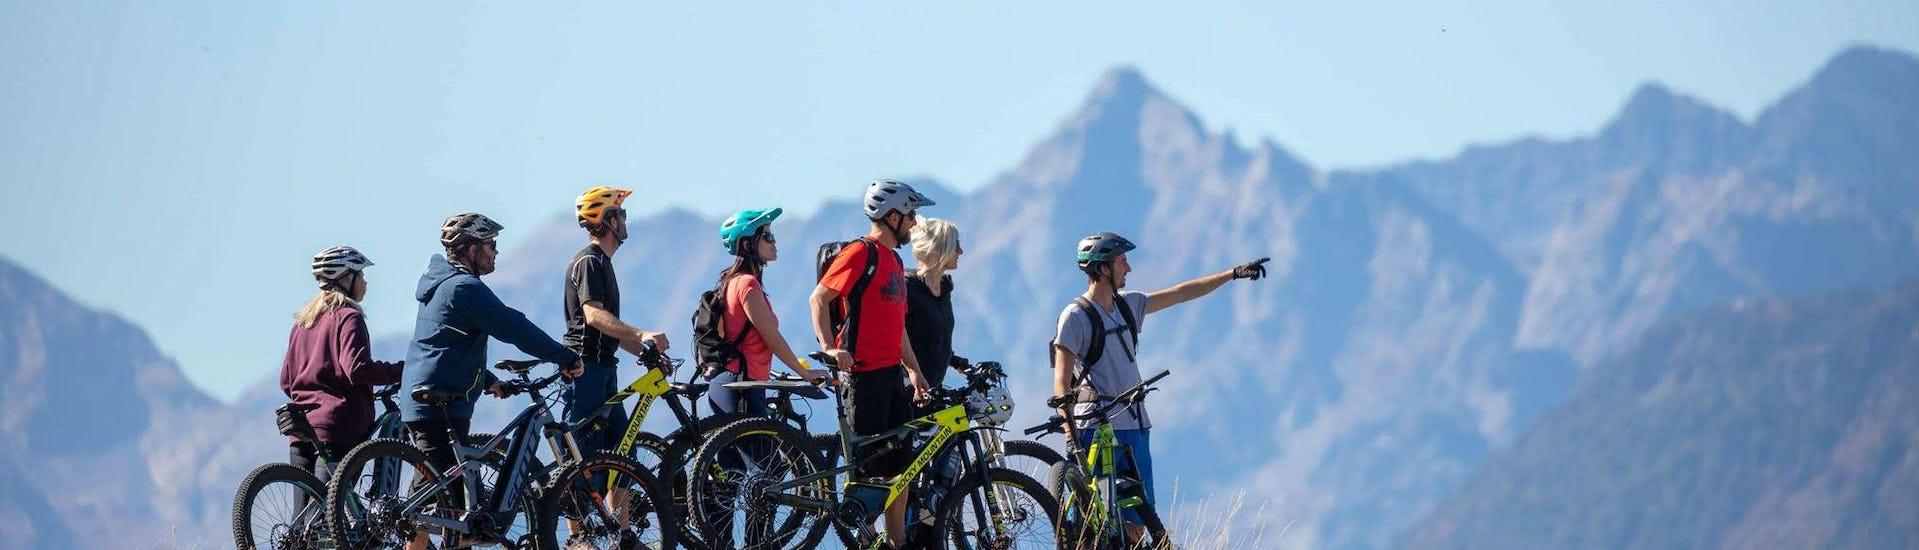 Mountain Bike Training - Intermediate